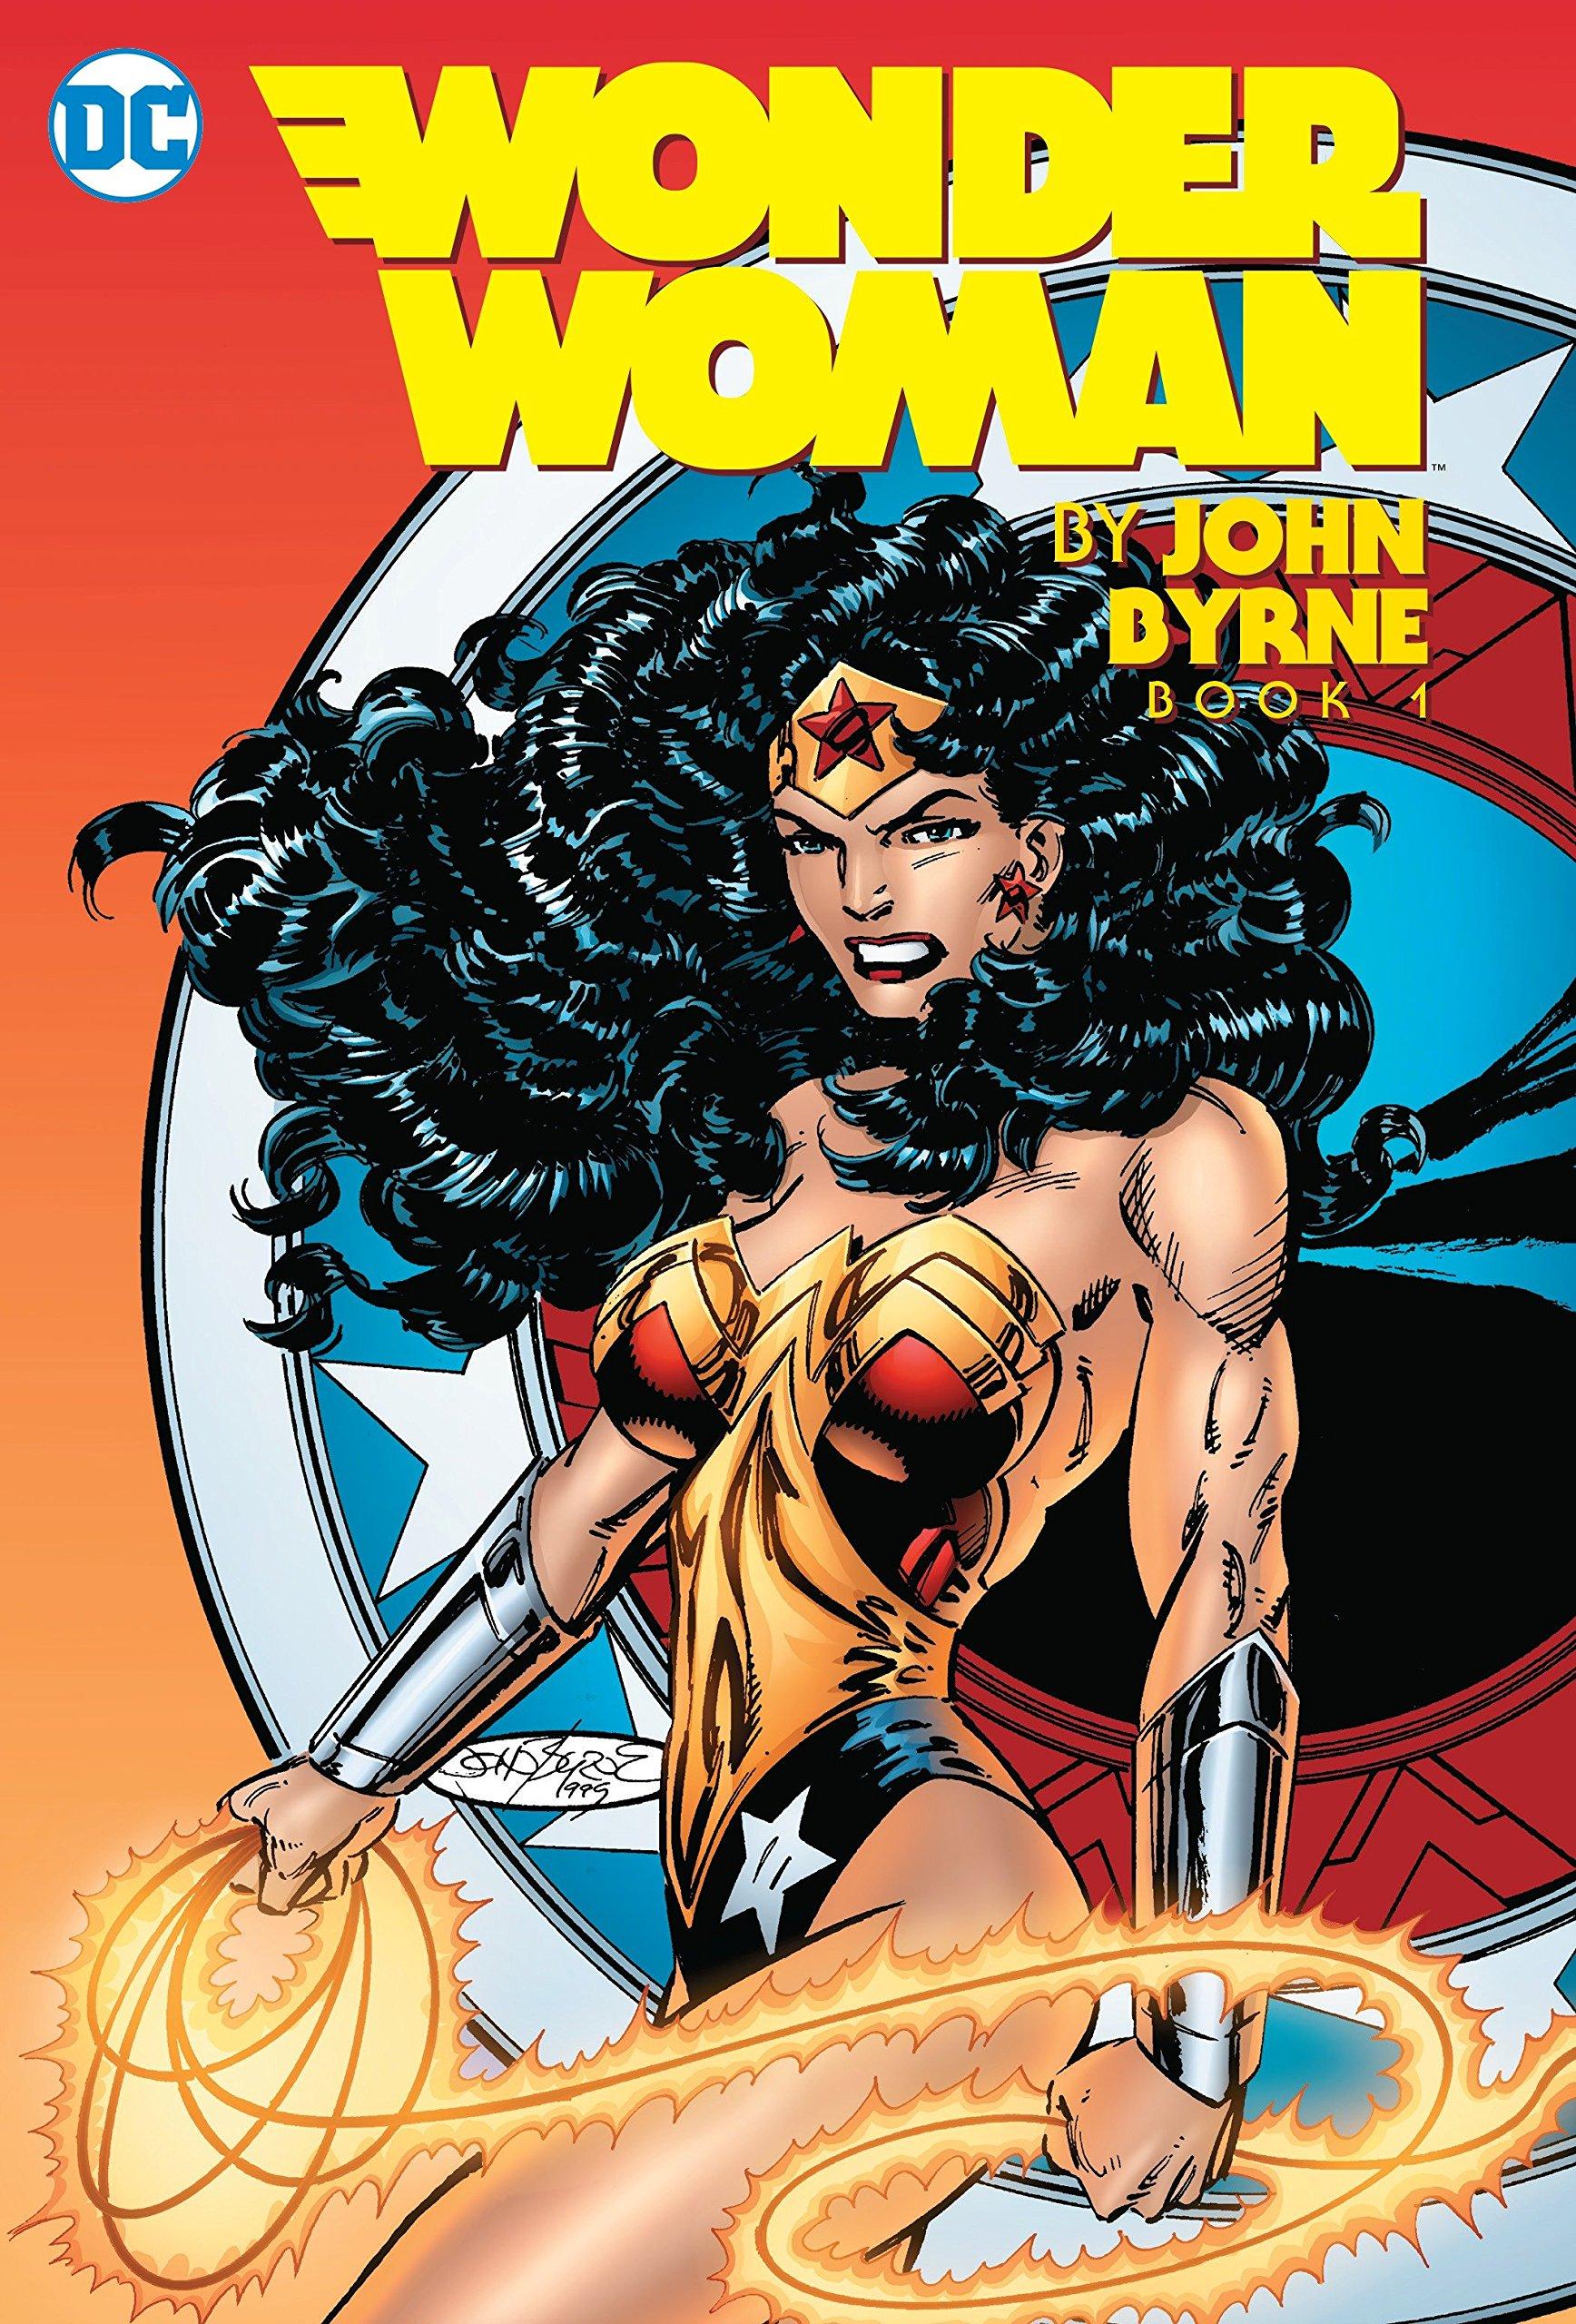 Amazon Com Wonder Woman By John Byrne Vol 1 9781401270841 Byrne John Books